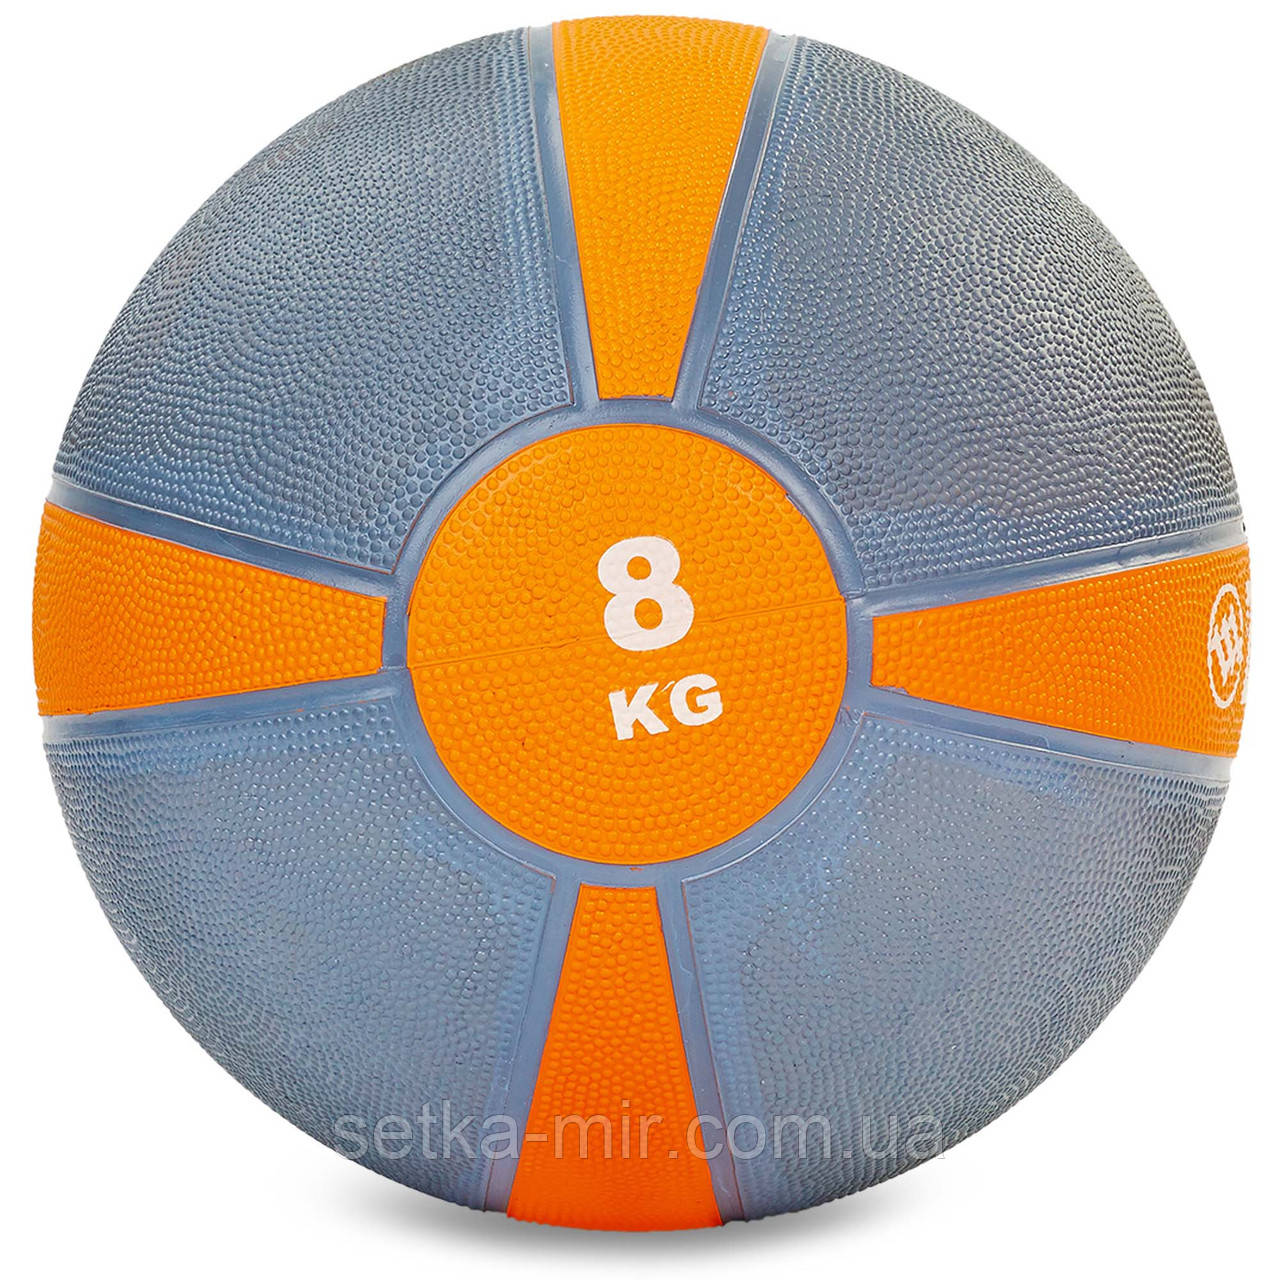 М'яч медичний медбол Zelart Medicine Ball FI-5122-8 8кг